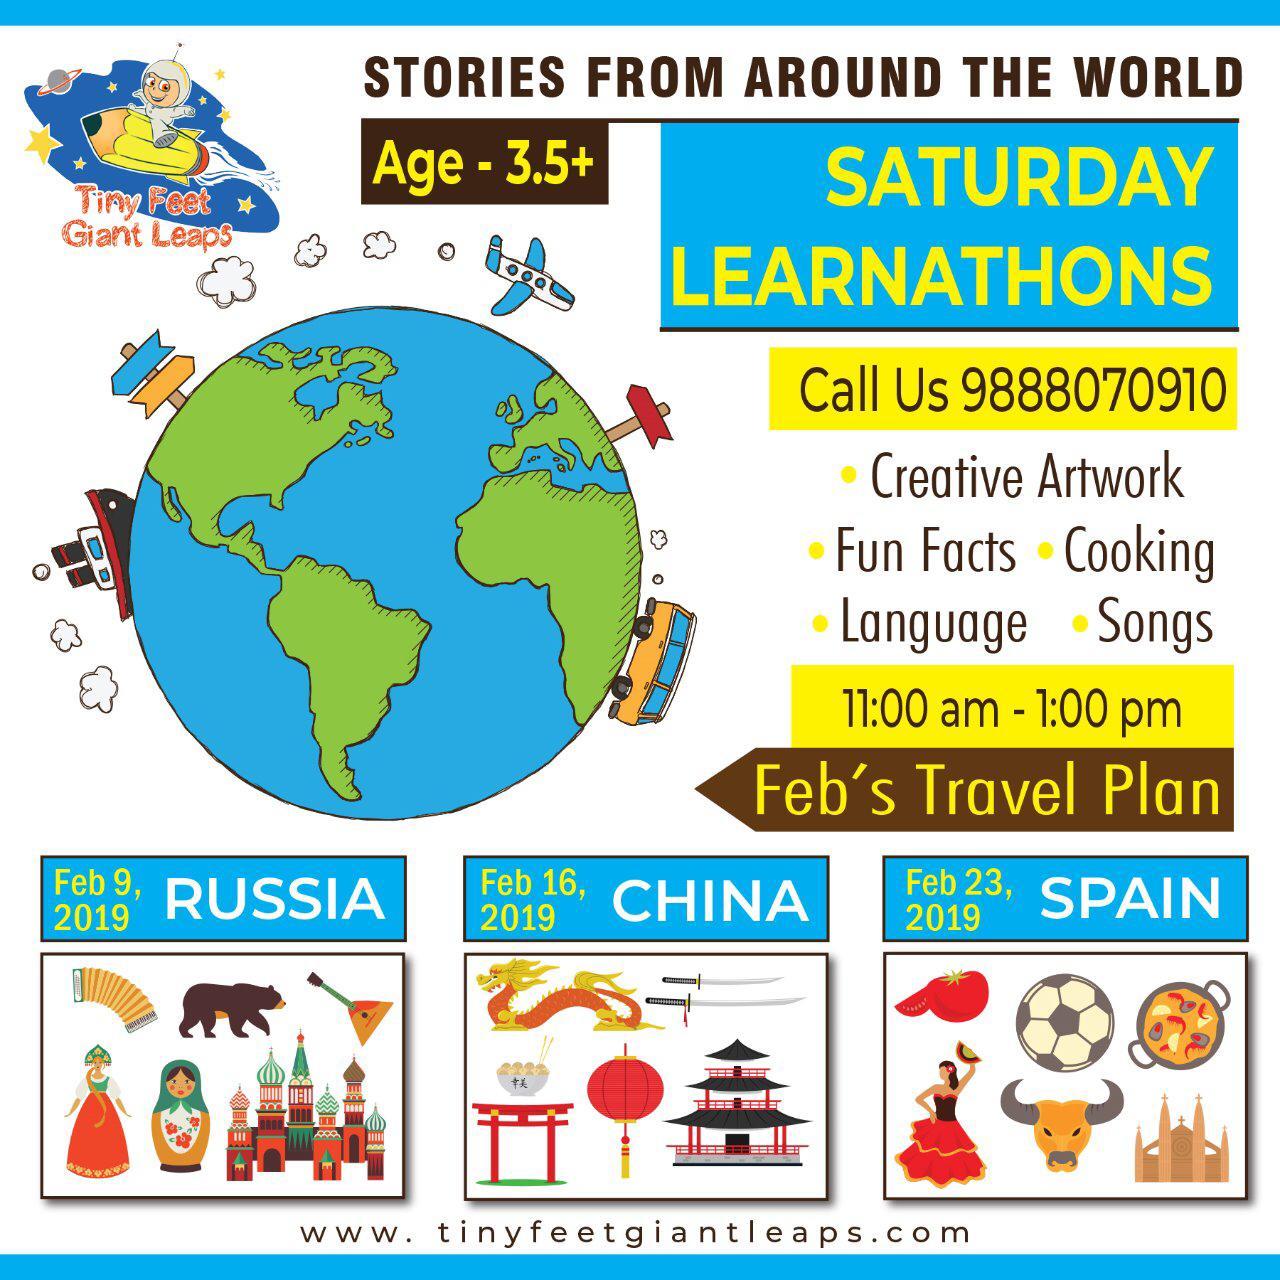 Upcoming Events in Chandigarh - Tutortot